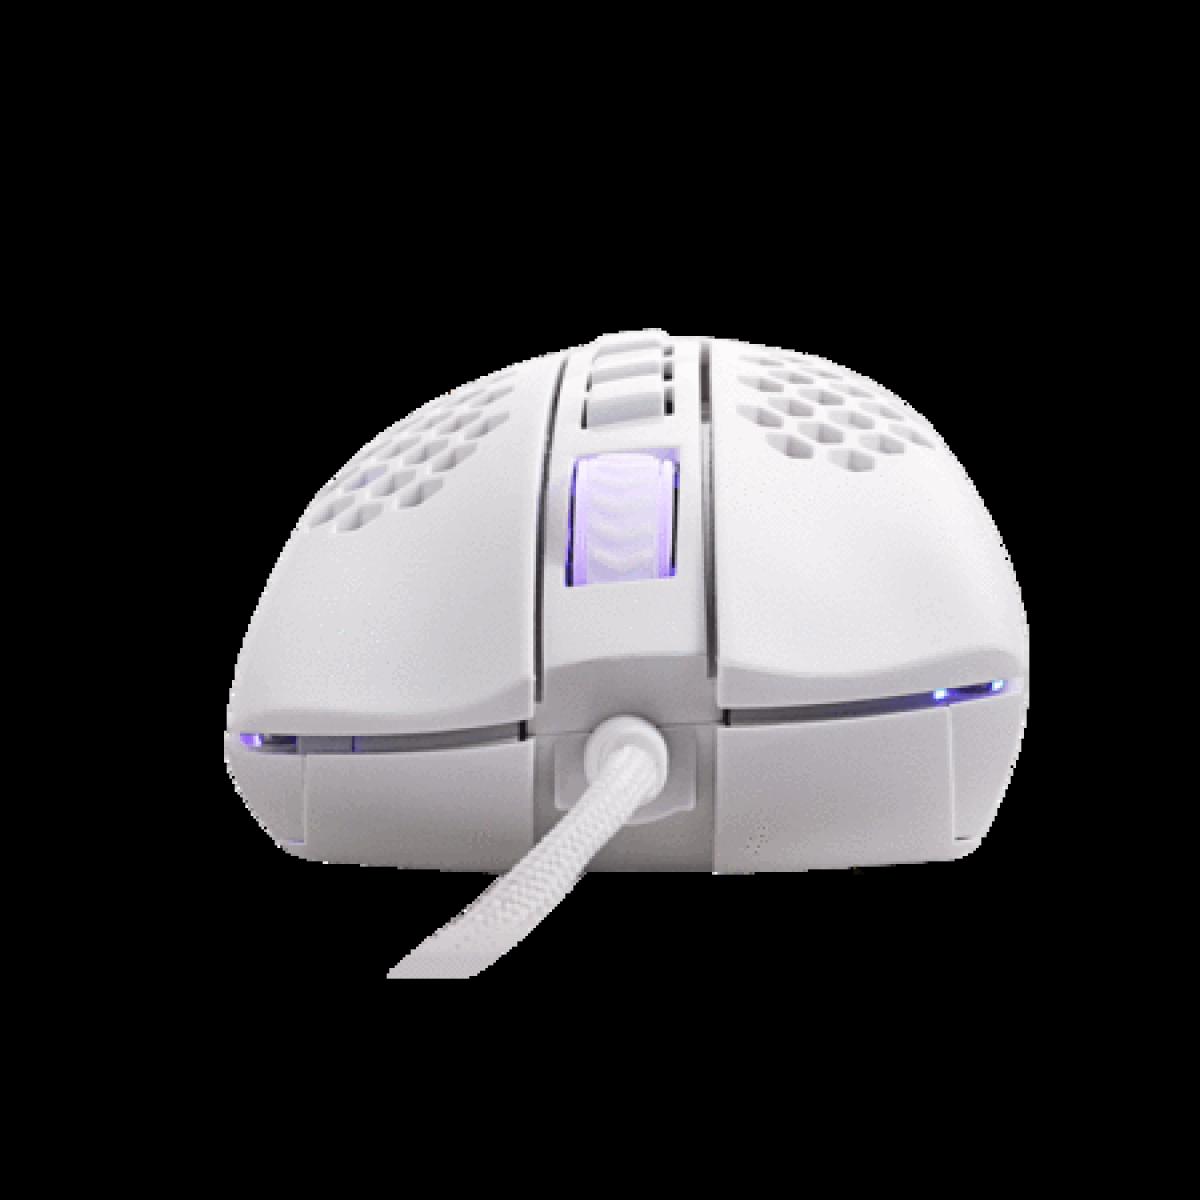 Mouse Gamer Redragon Storm Lunar White, 12400DPI, 7 Botões Programáveis, RGB, White, M808W-RGB